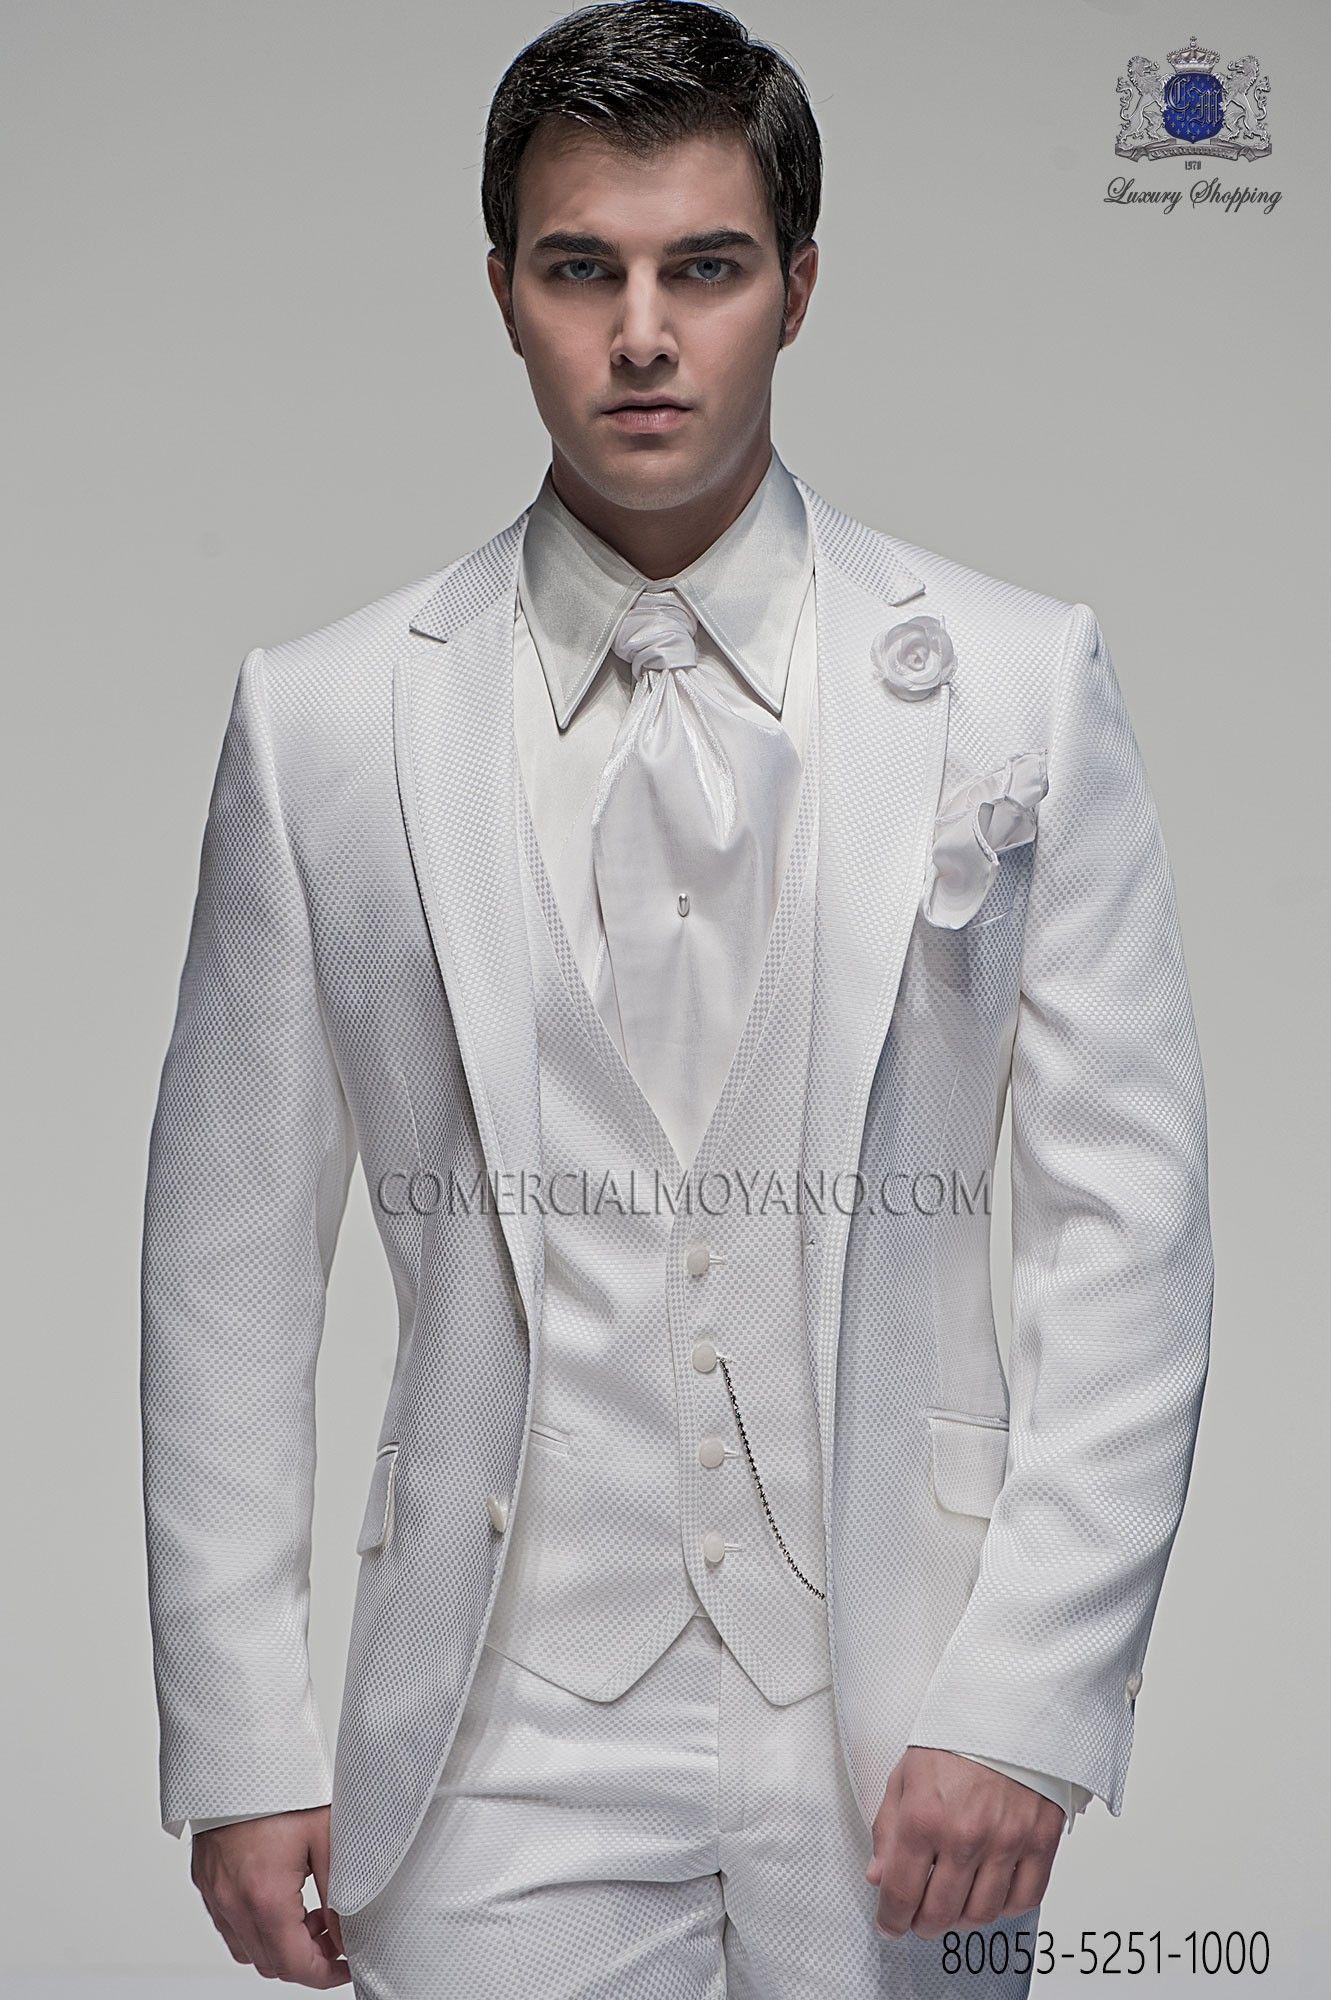 ottavio nuccio 2015 - Buscar con Google | Wedding | Pinterest ...